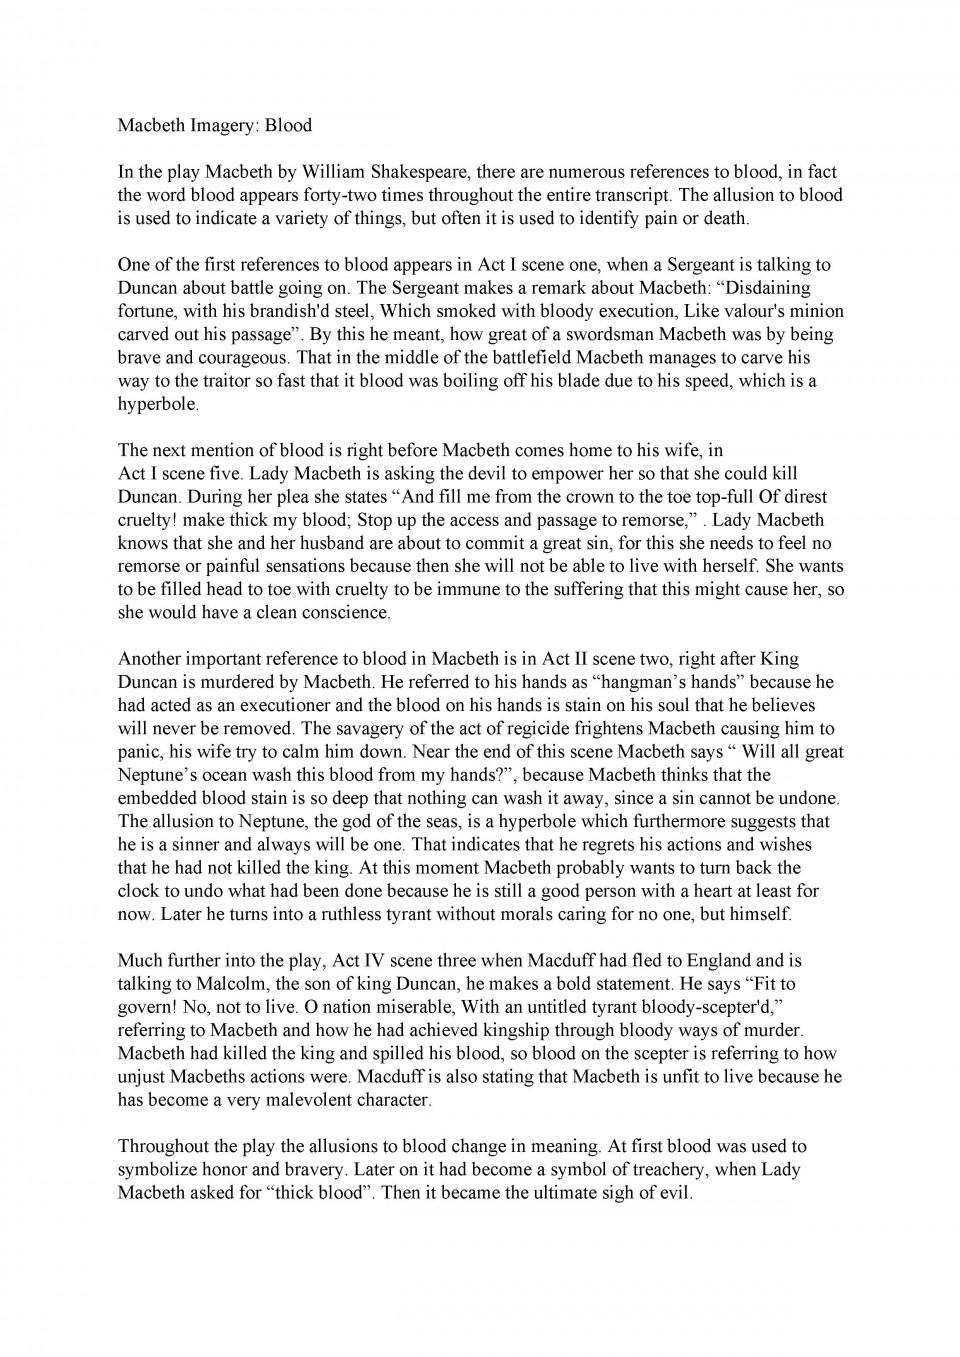 002 Macbeth Essay Sample Impressive Example Good About Yourself Examples Pdf Descriptive 960